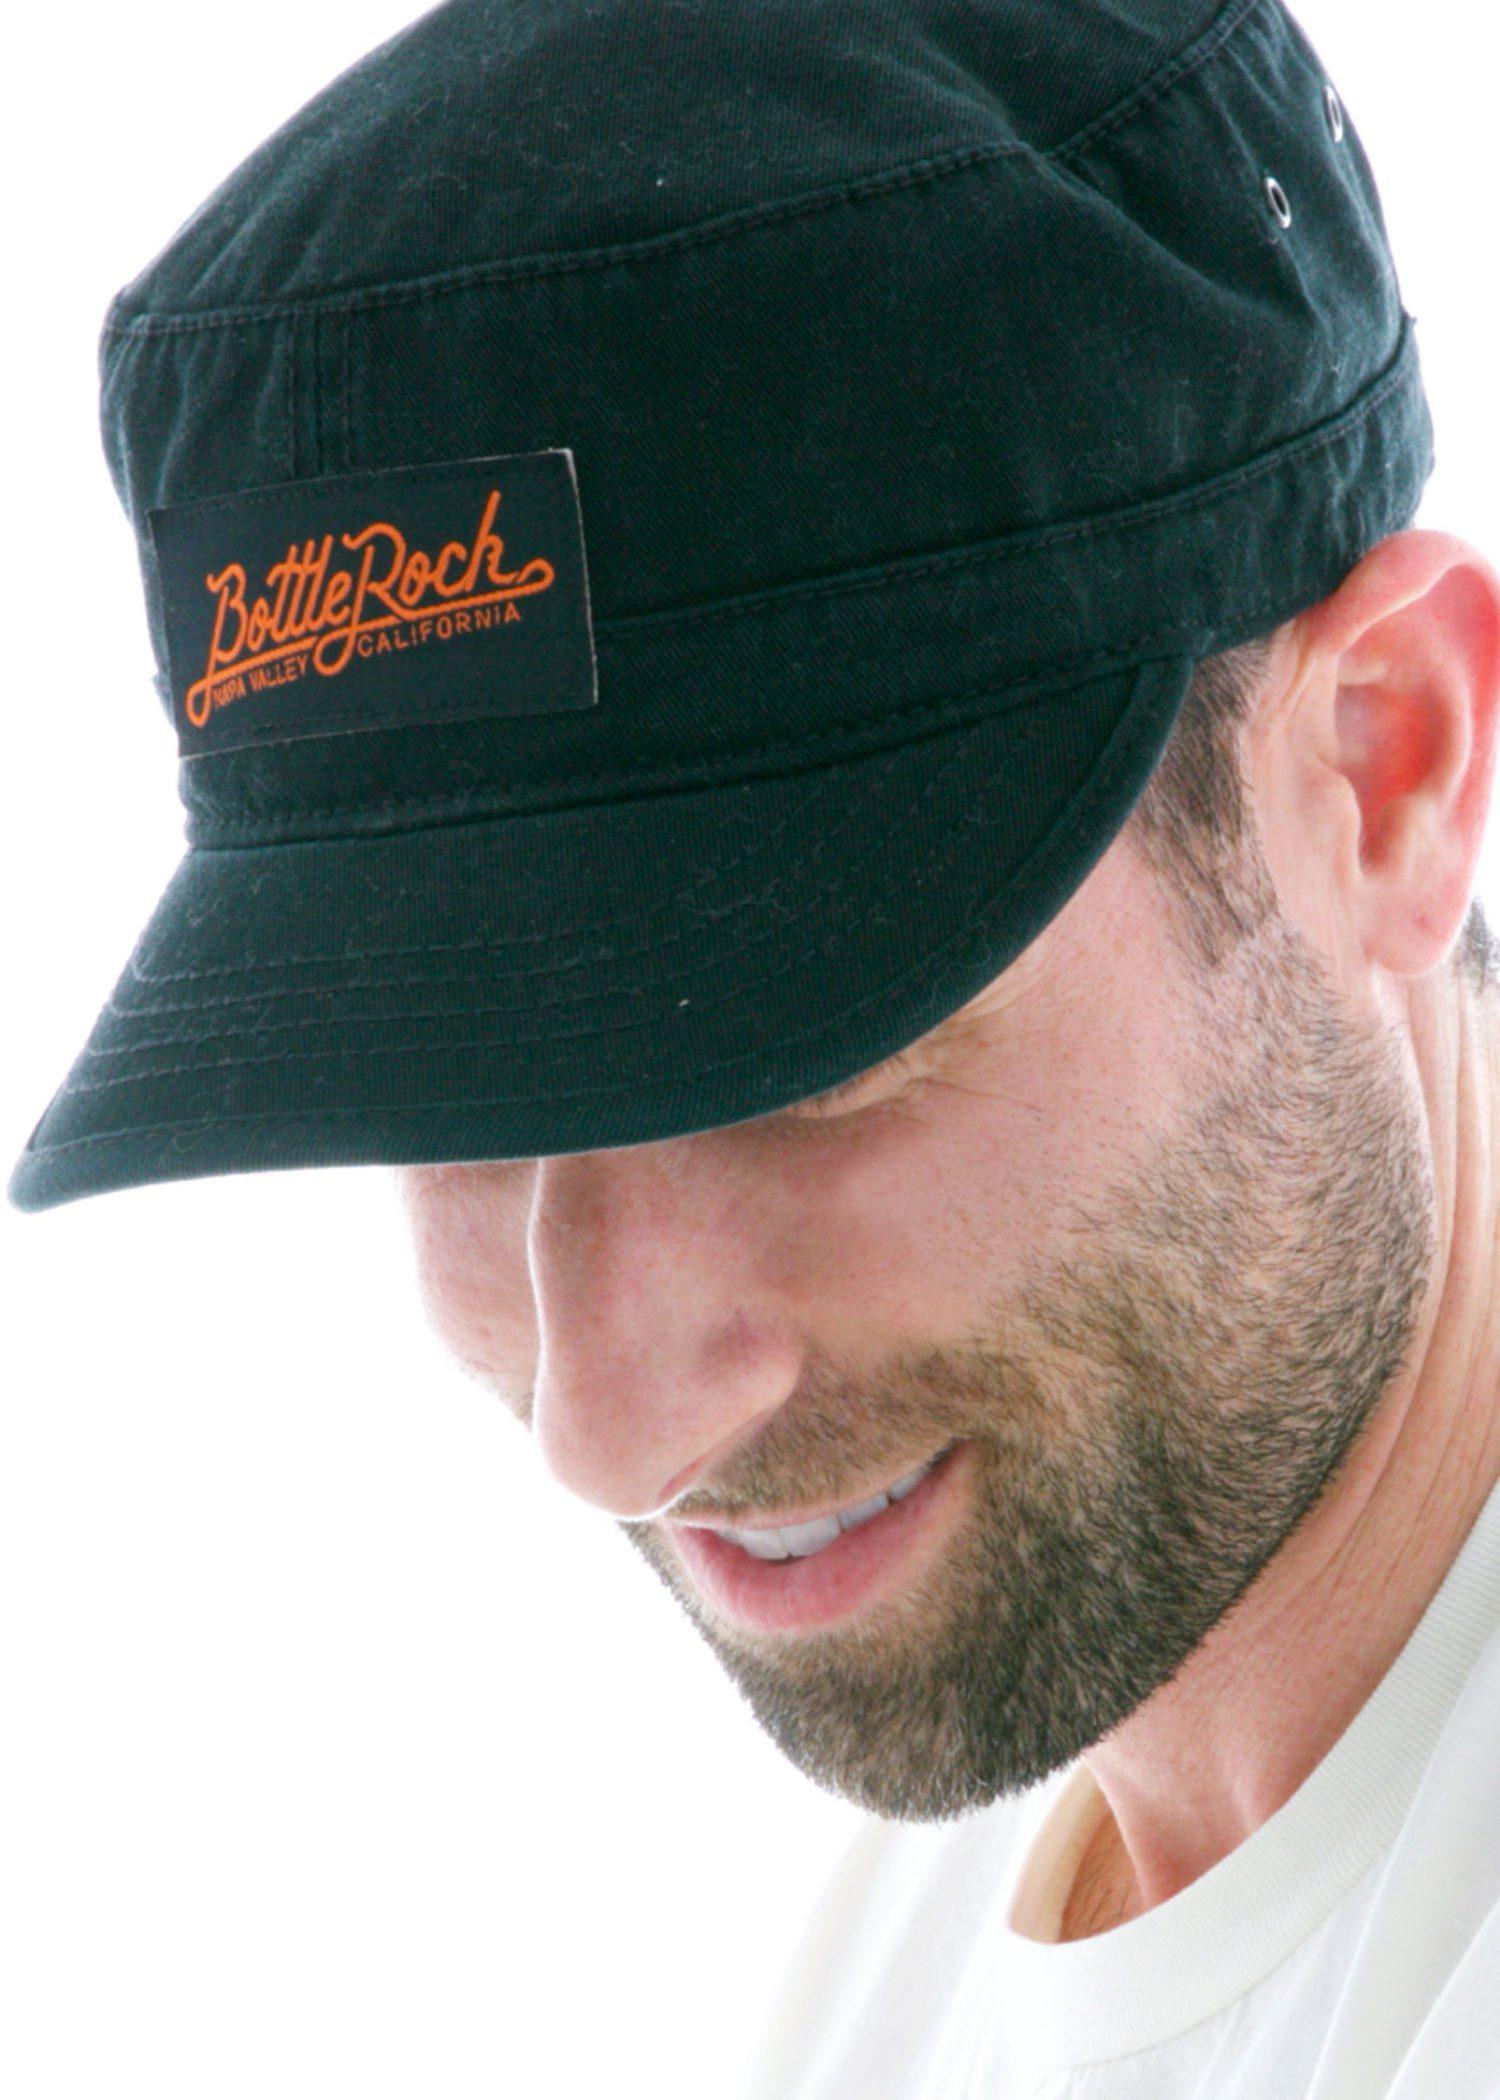 Custom Military Caps for Men and Women